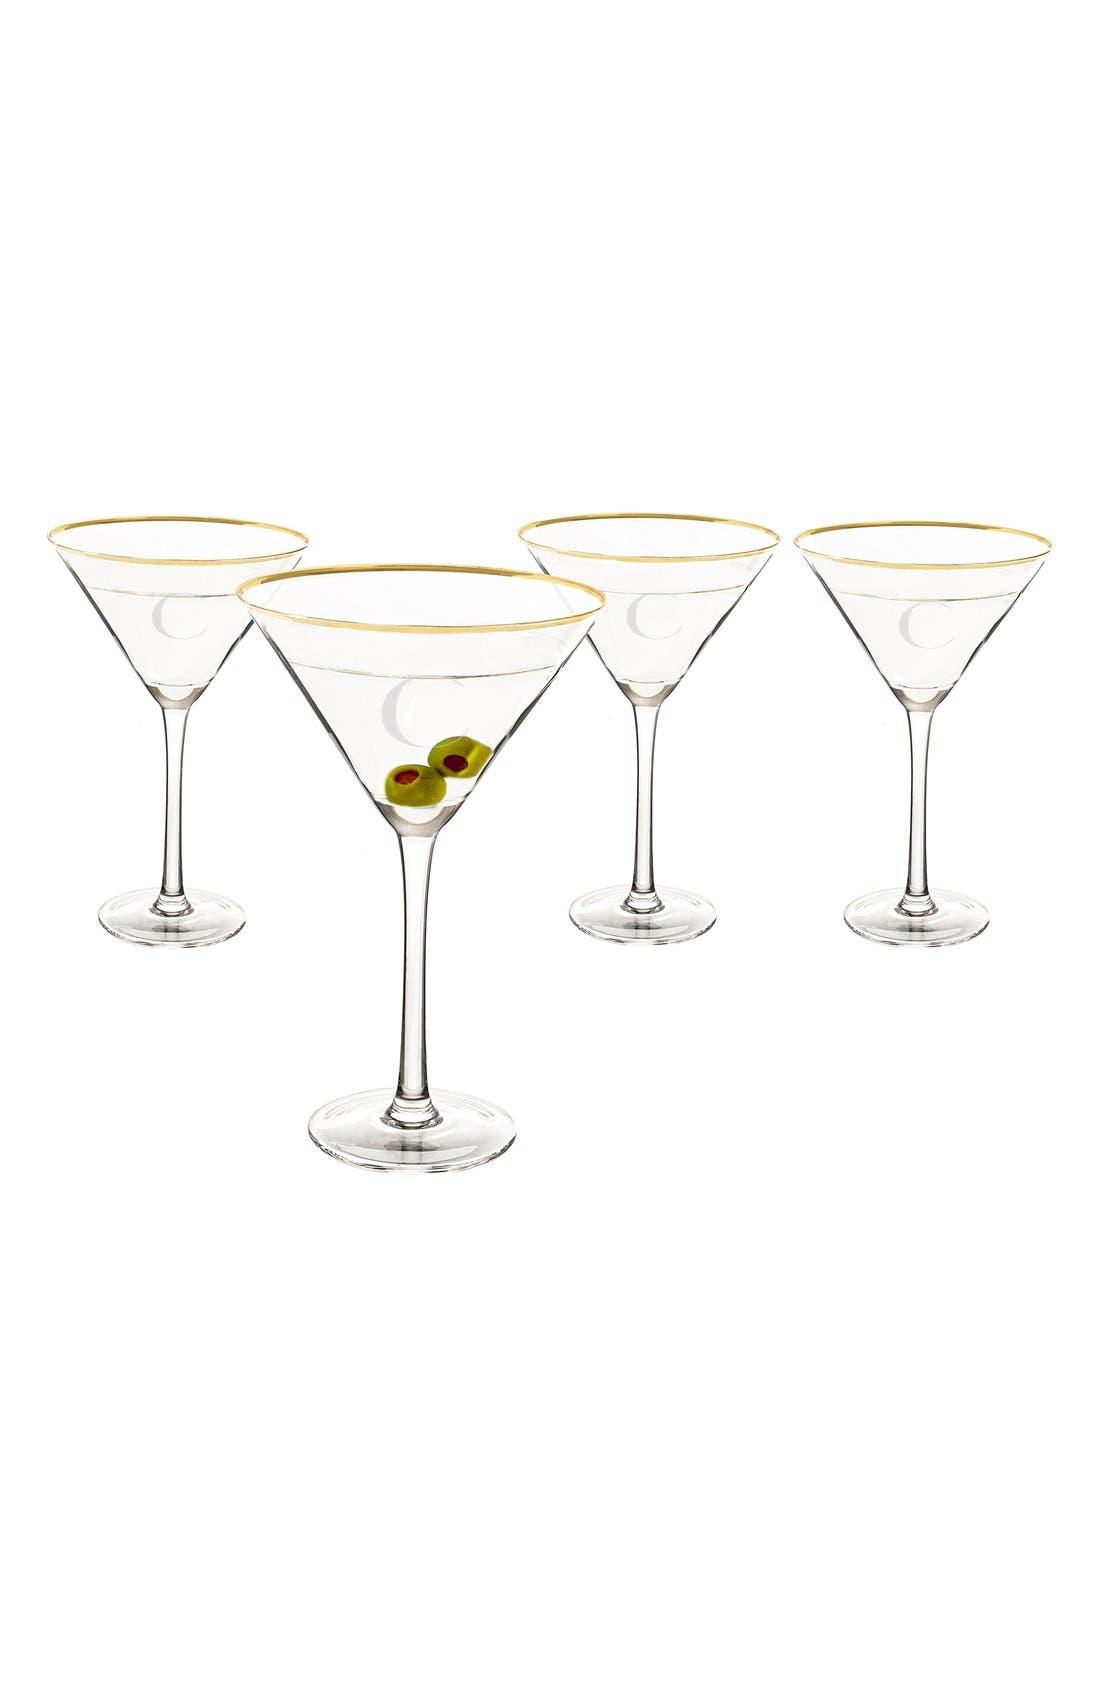 cathyu0027s concepts set of 4 gold rimmed monogram martini glasses